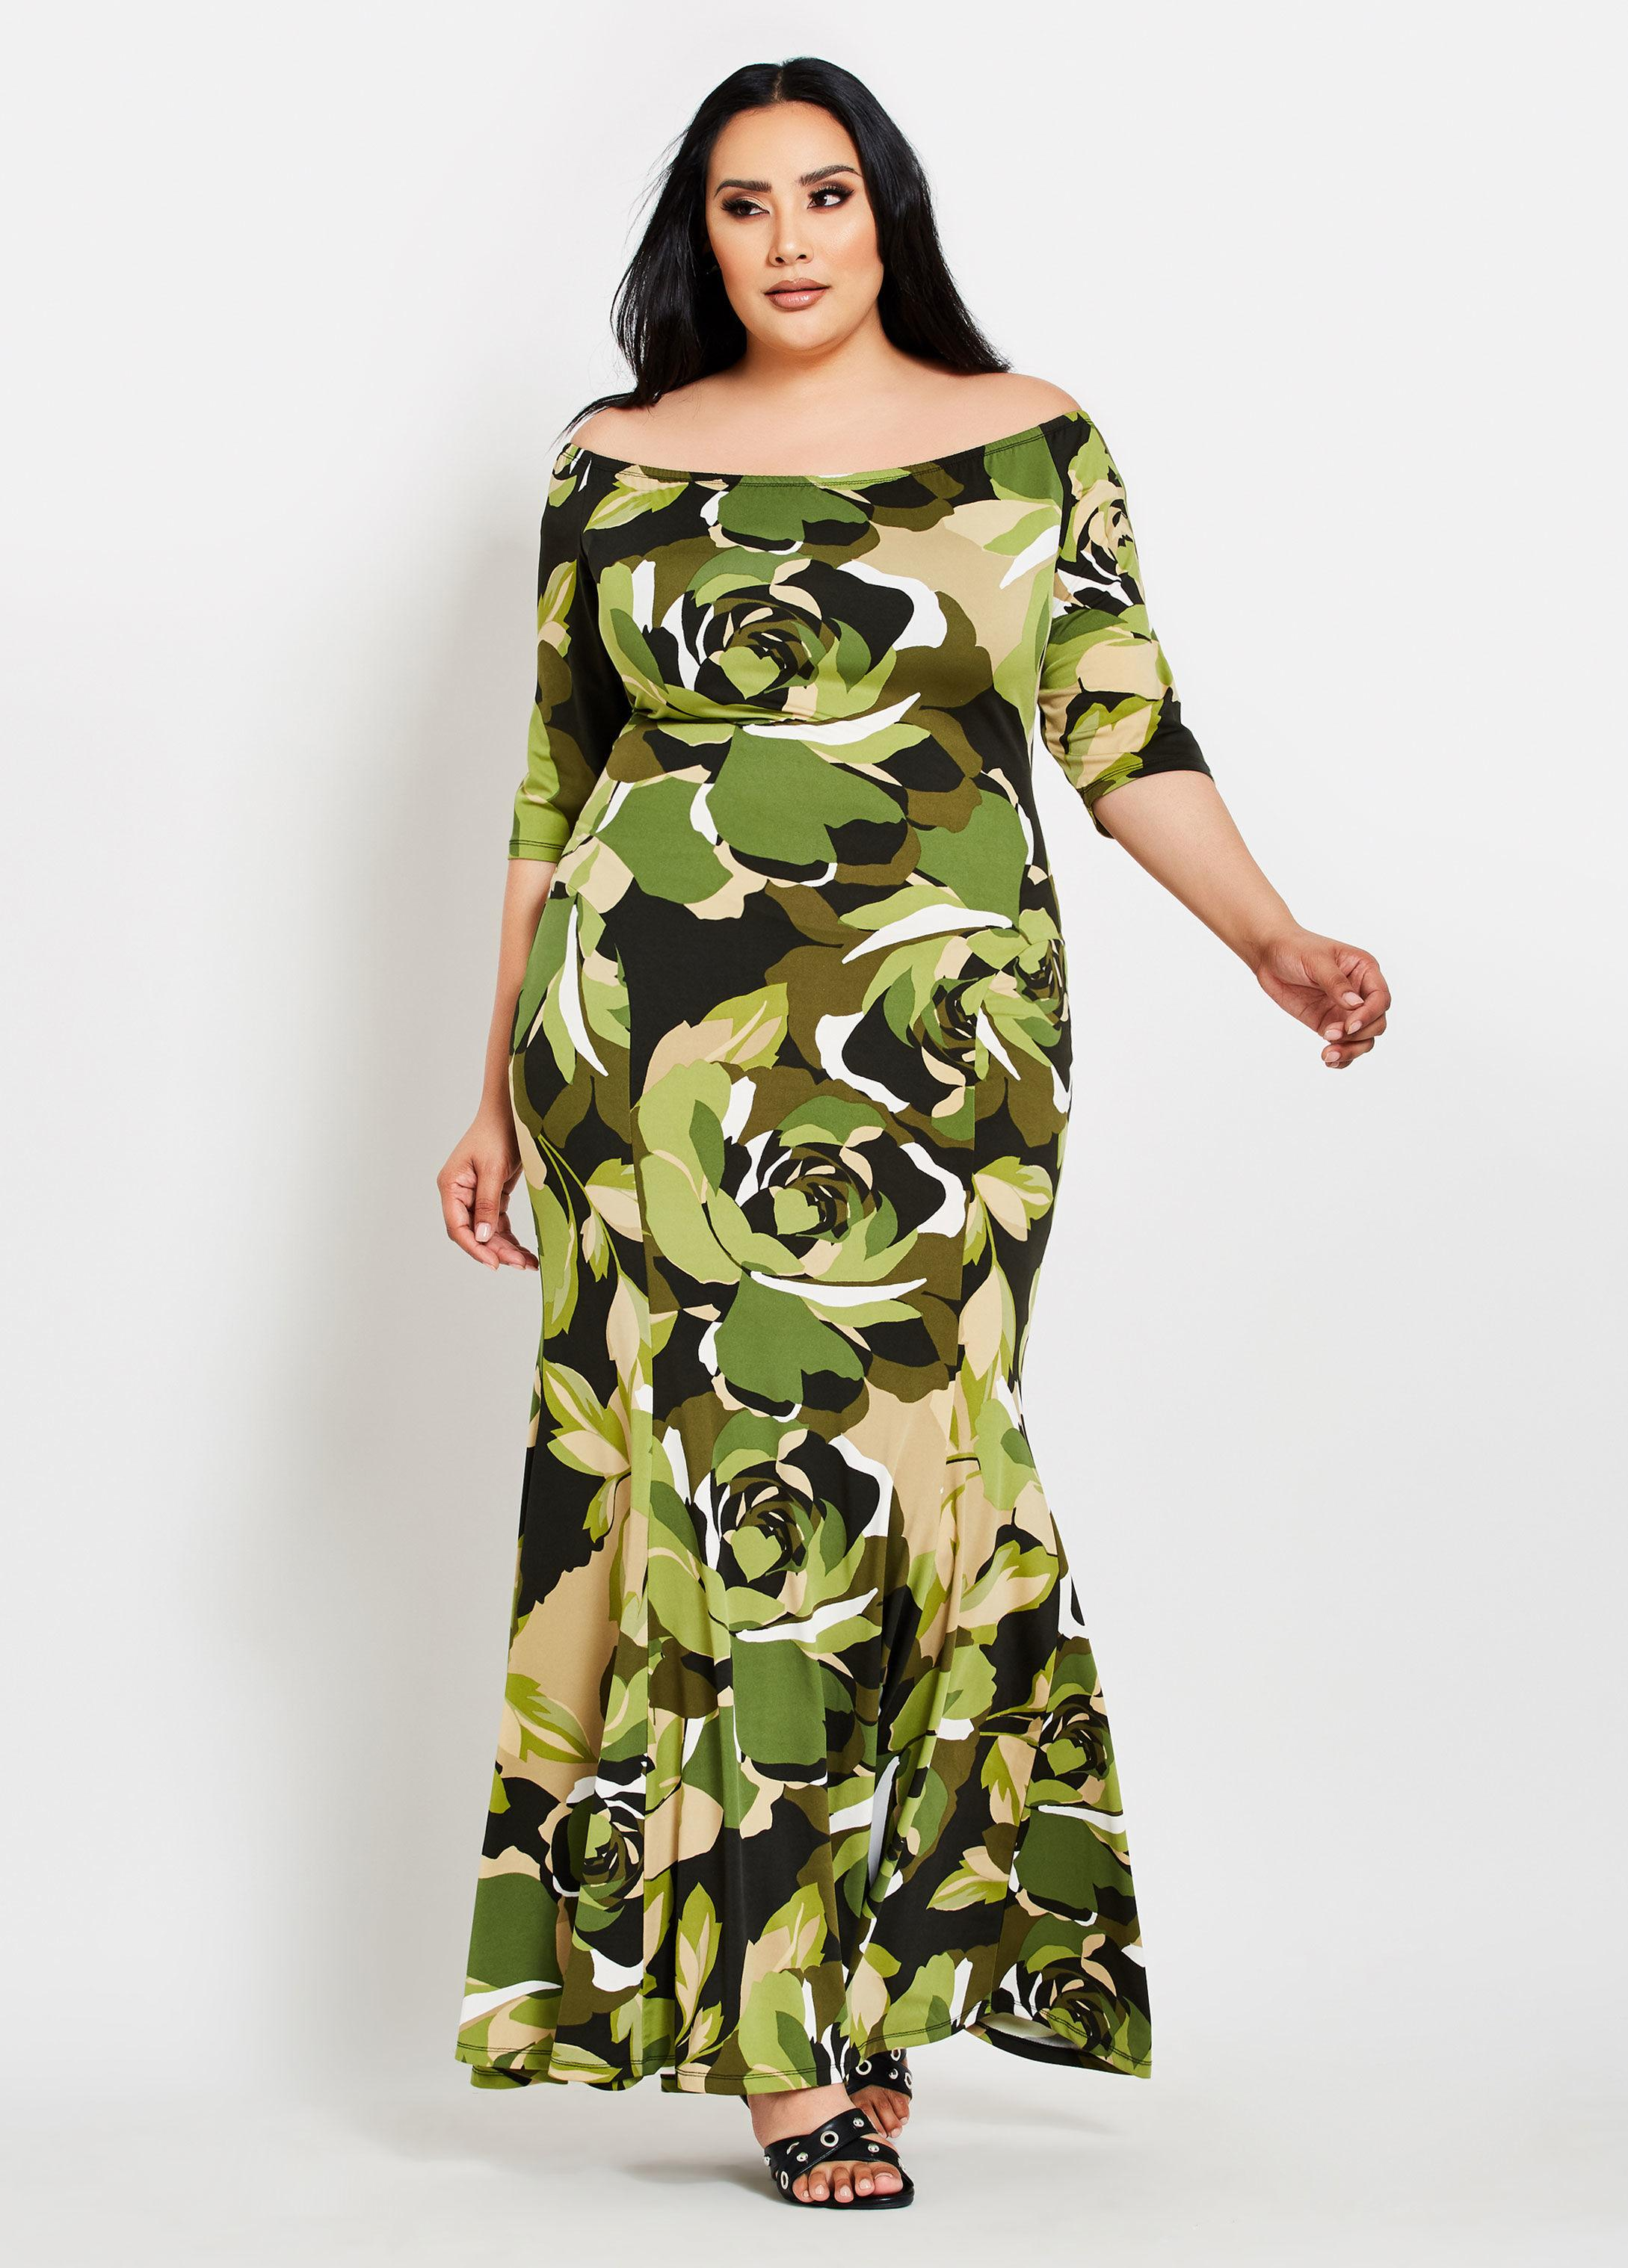 Plus Size Floral Camo Mermaid Maxi Dress